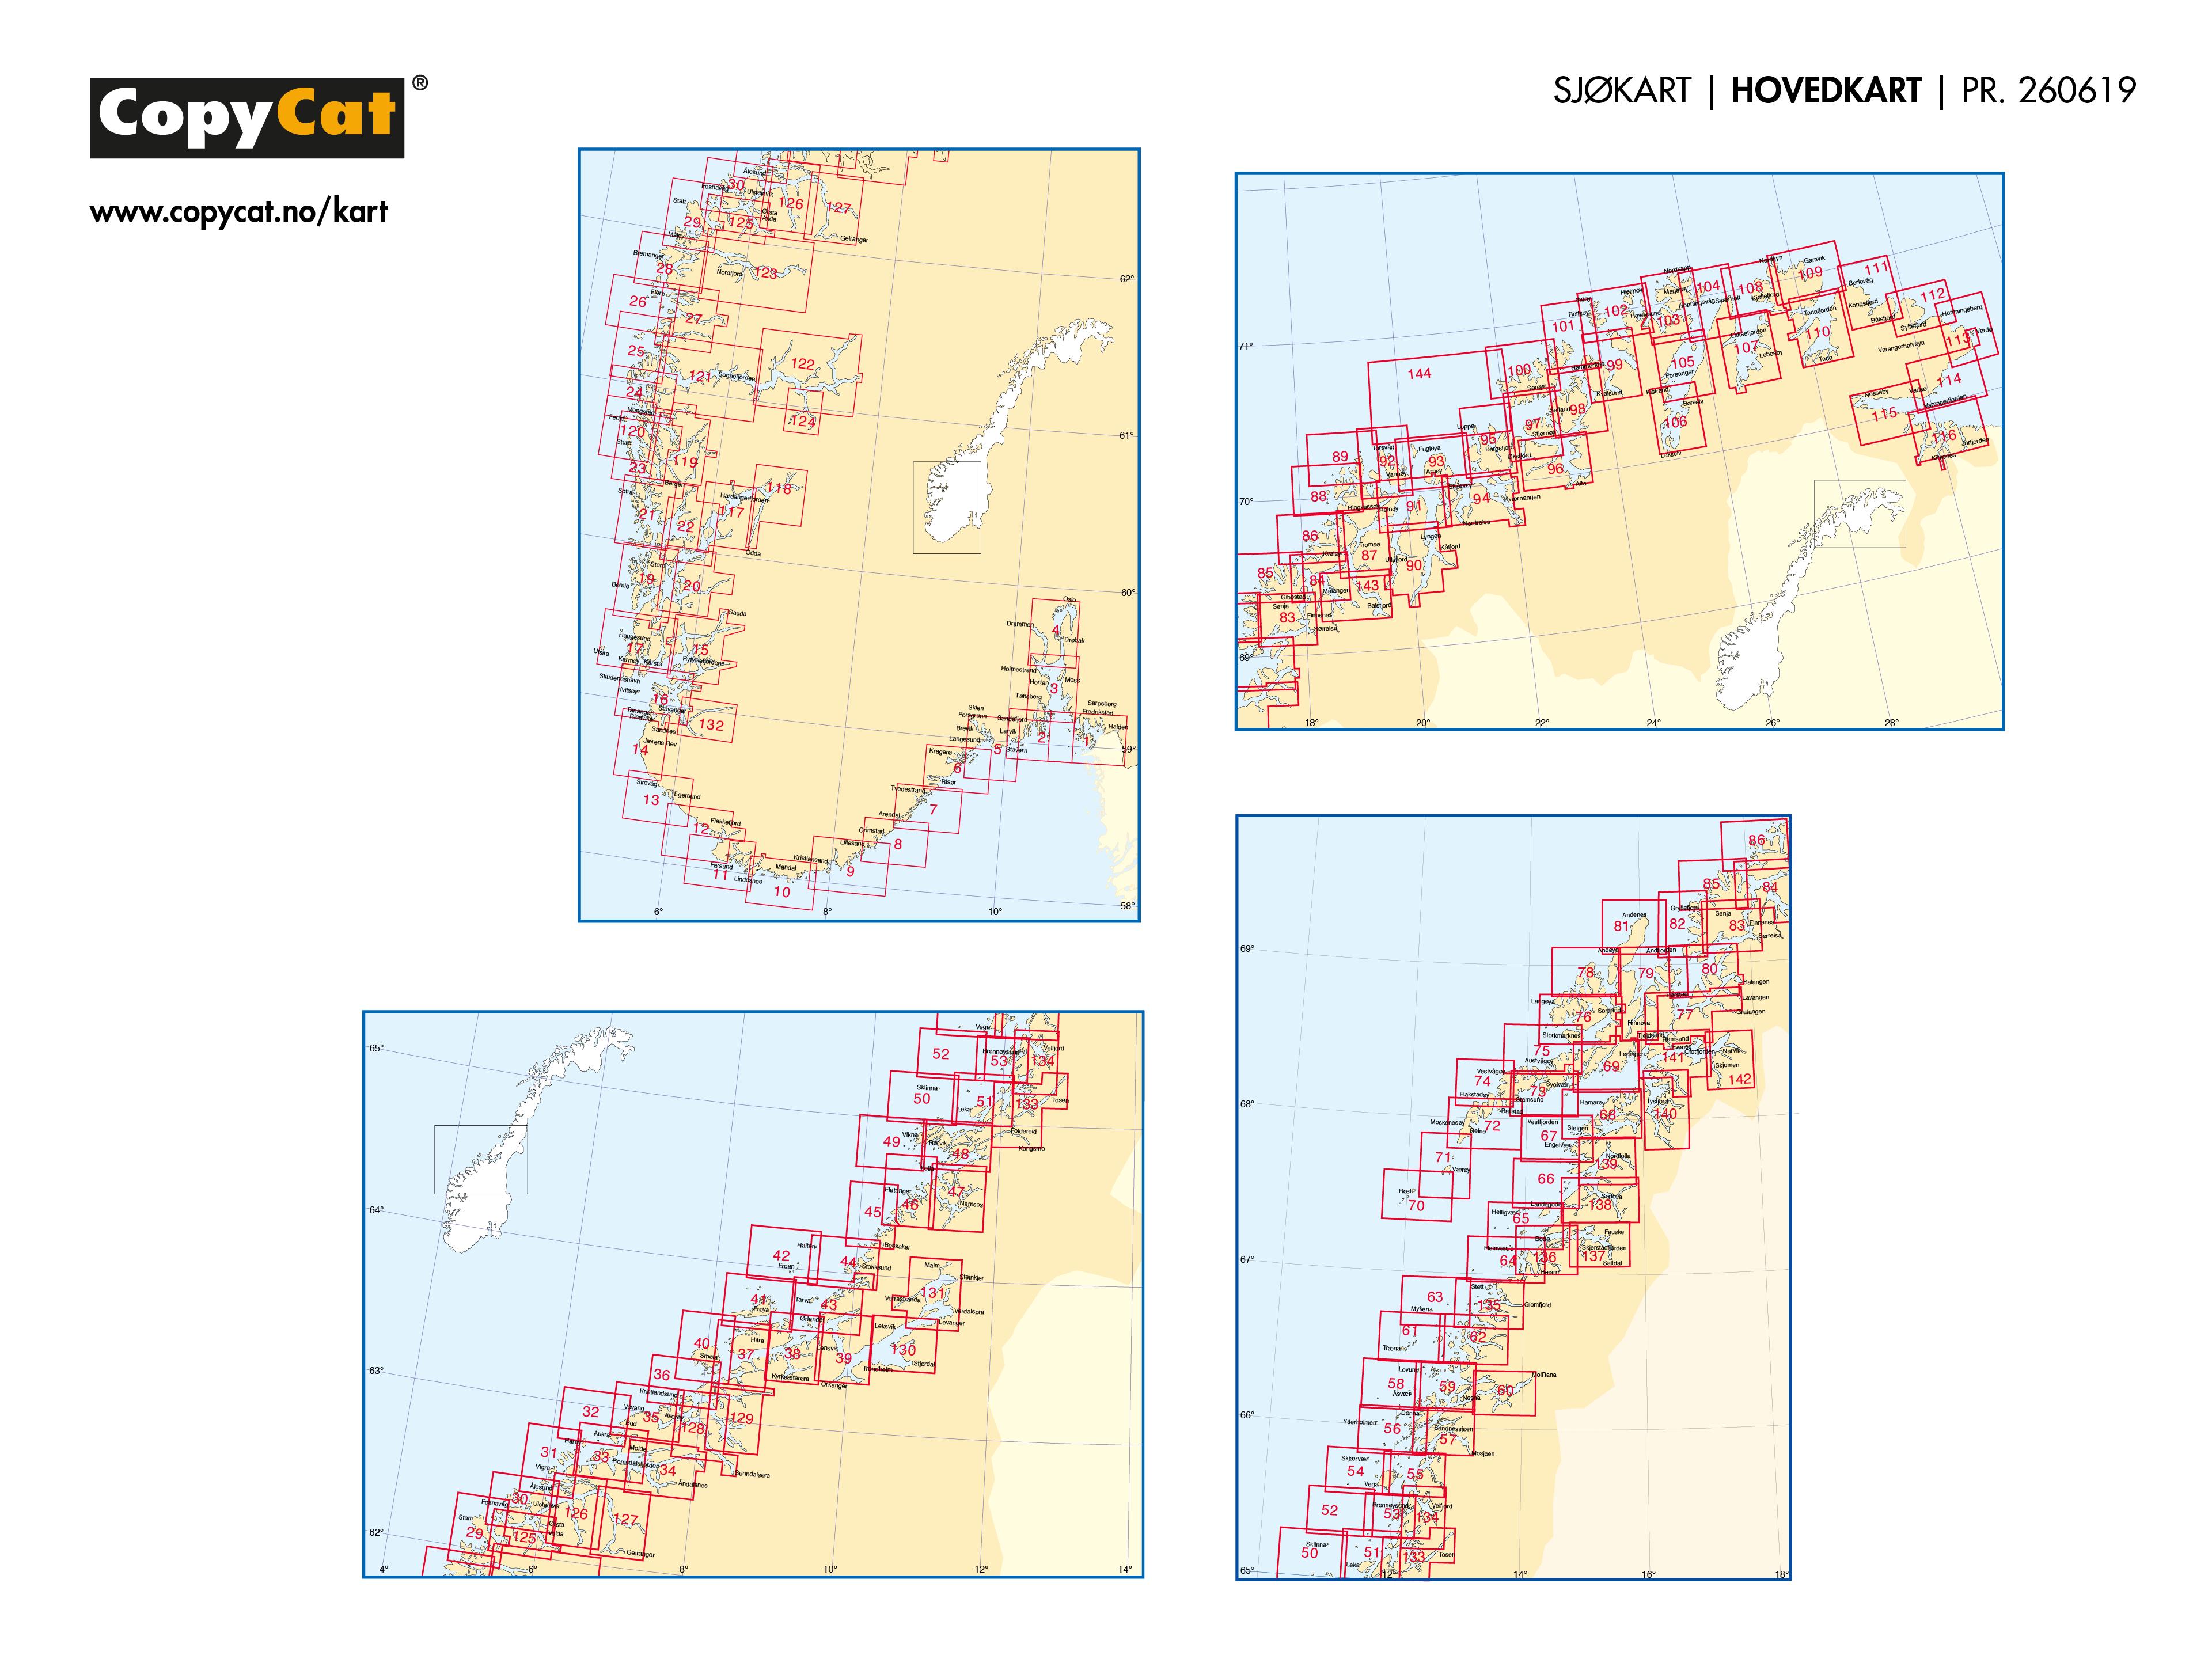 CopyCat Sjøkart Hovedkart